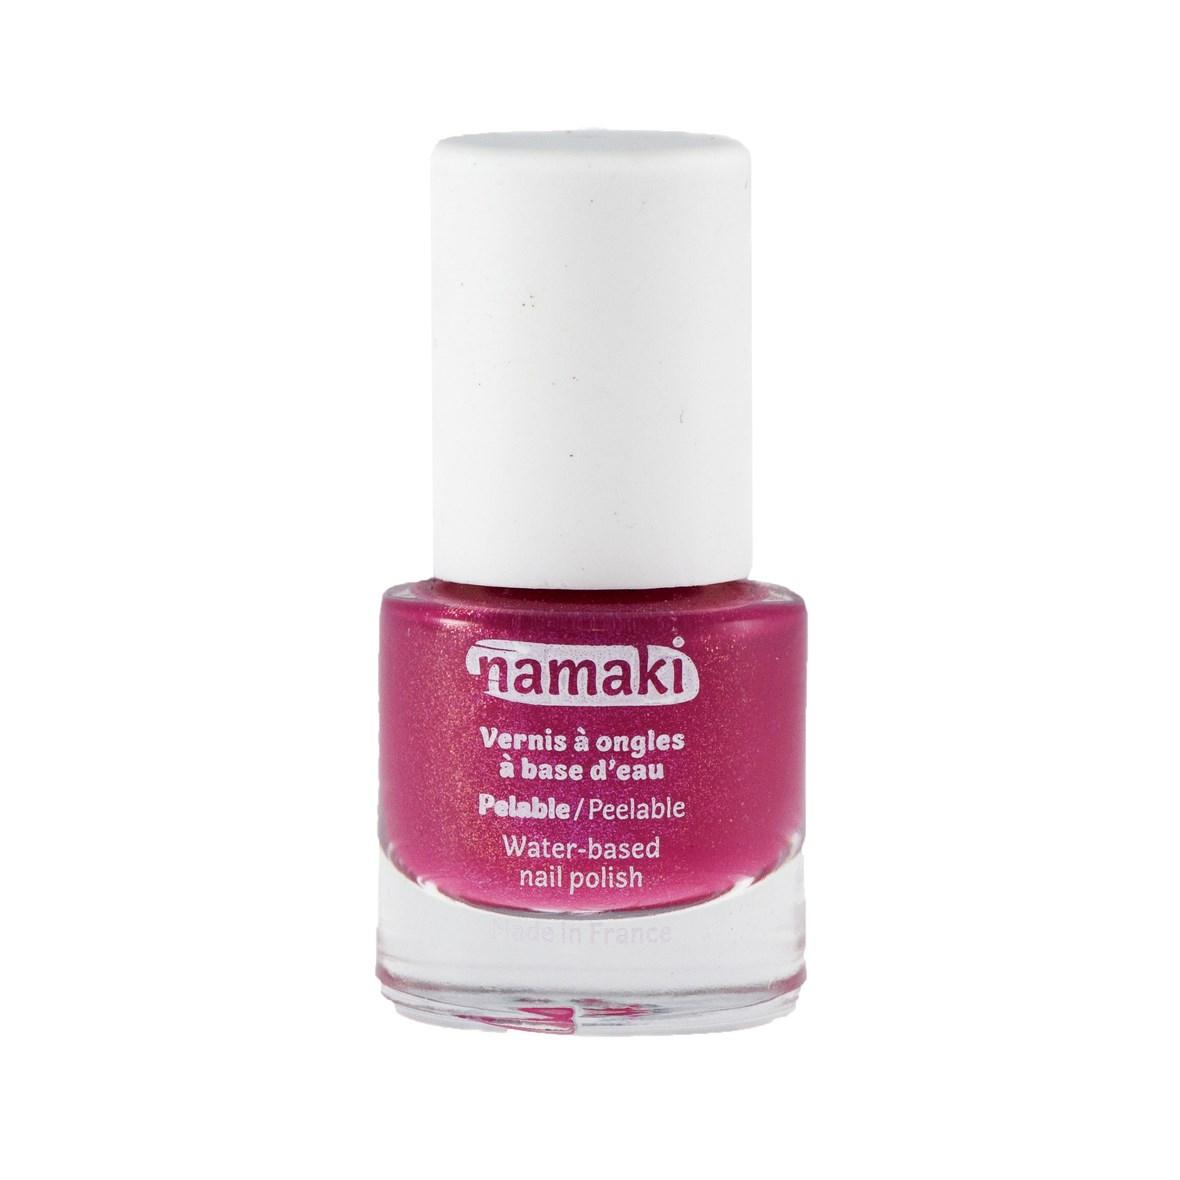 Doux Good - Vernis à ongles Namaki 12 Fuchsia